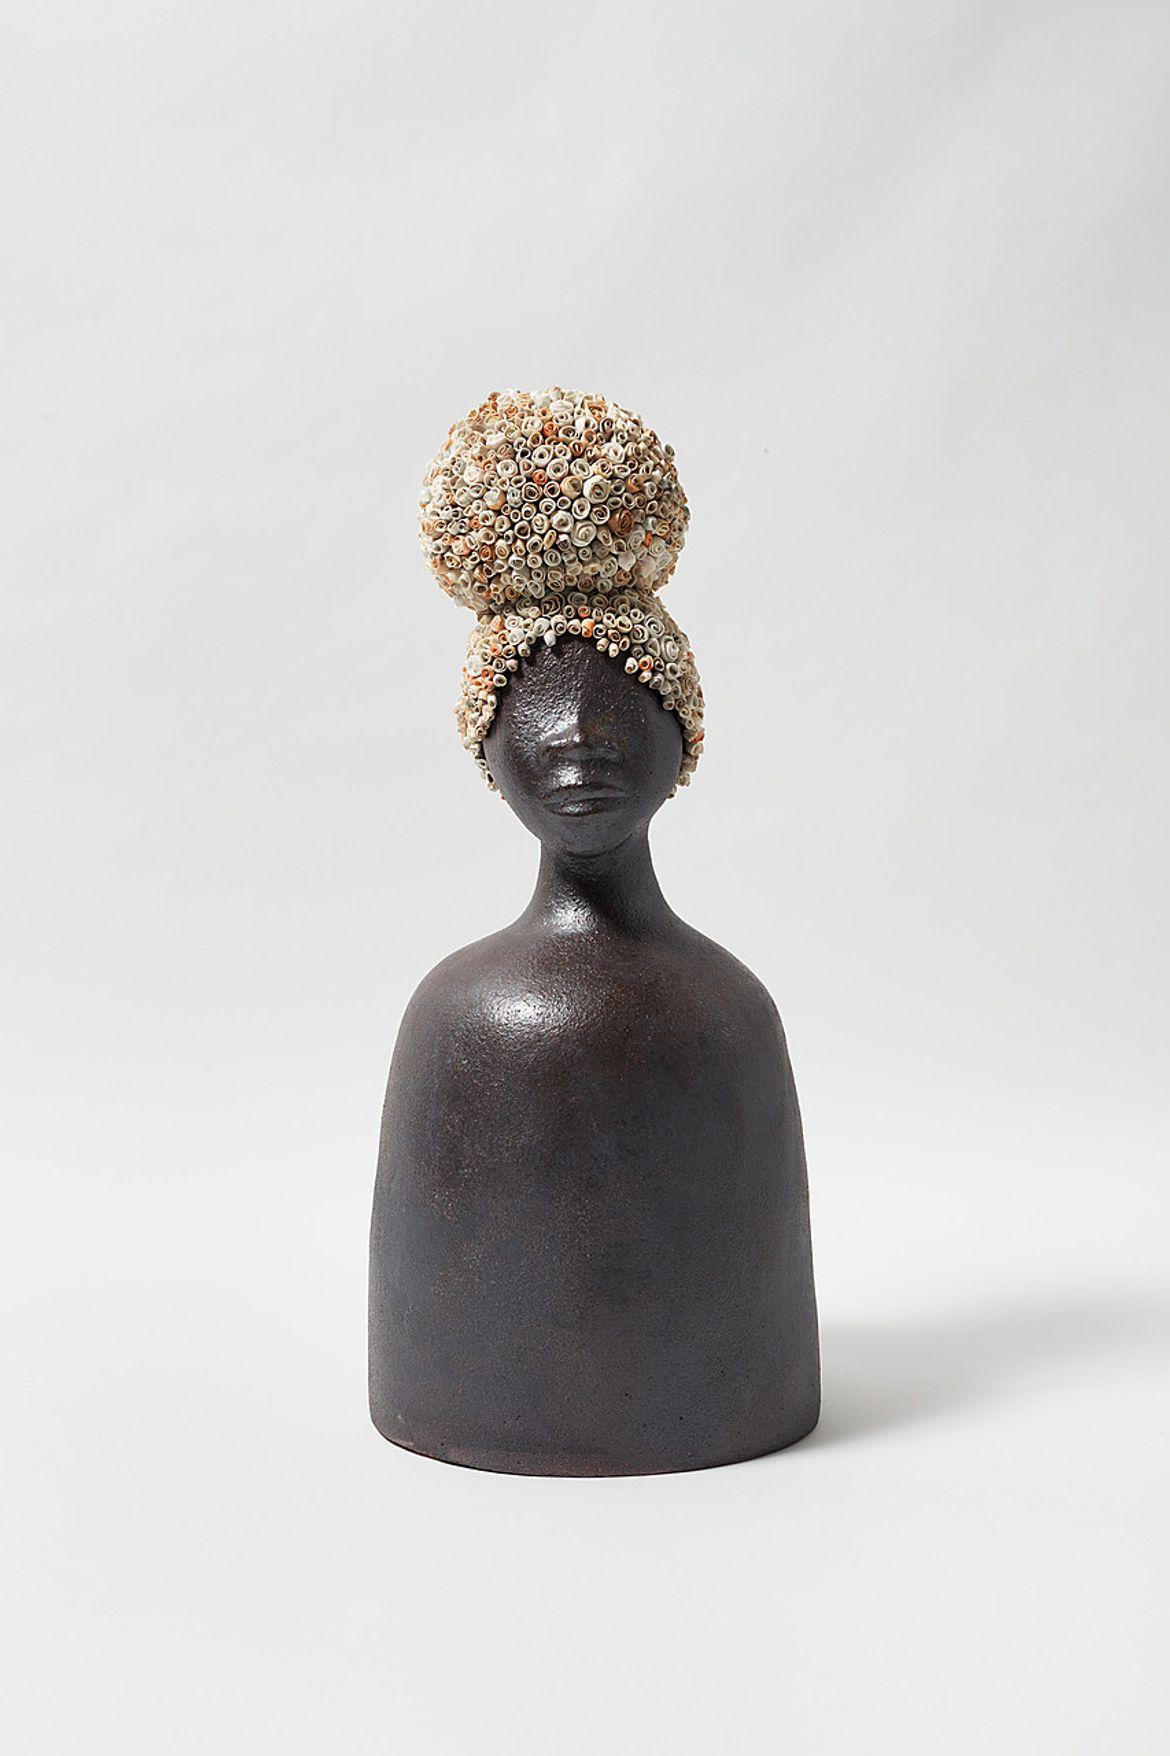 Online Course: Sculpture at the Guggenheim Museum